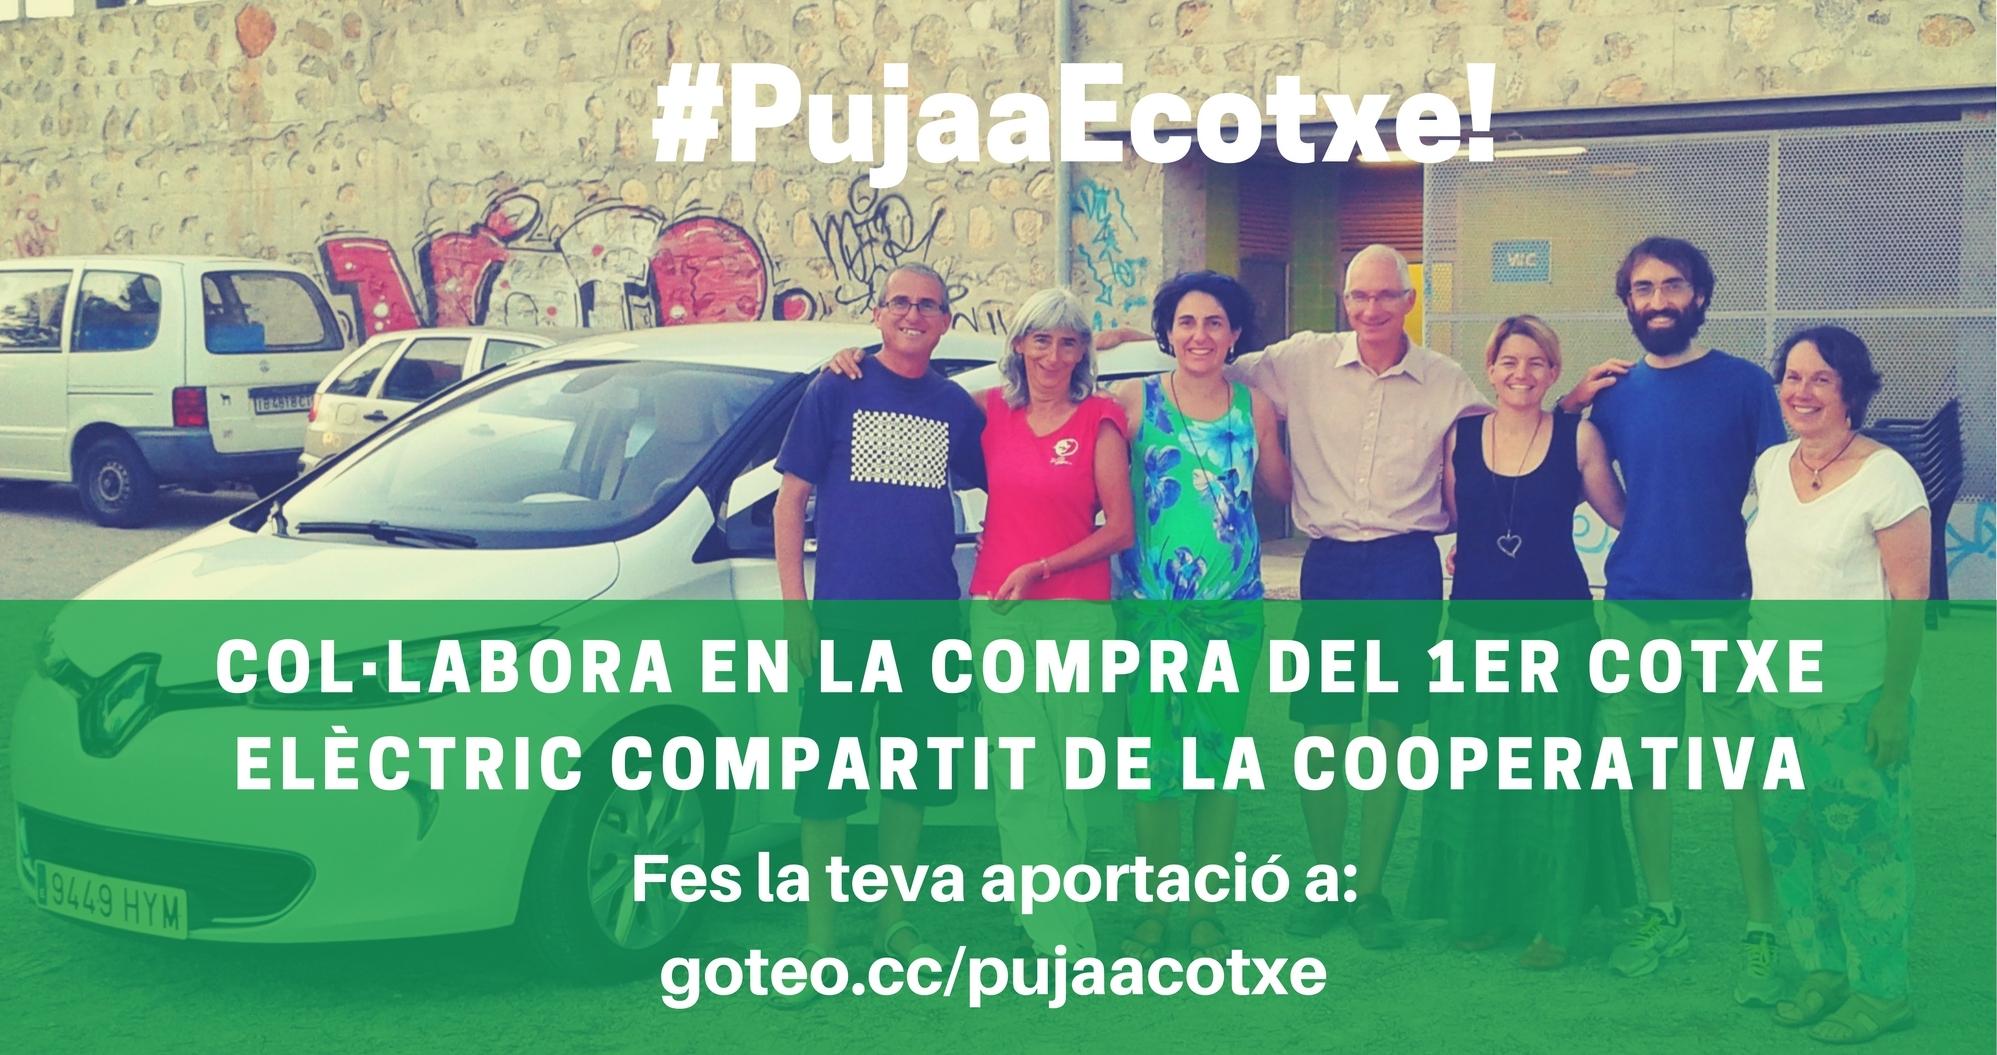 ecotxe_goteo_banner_nologo